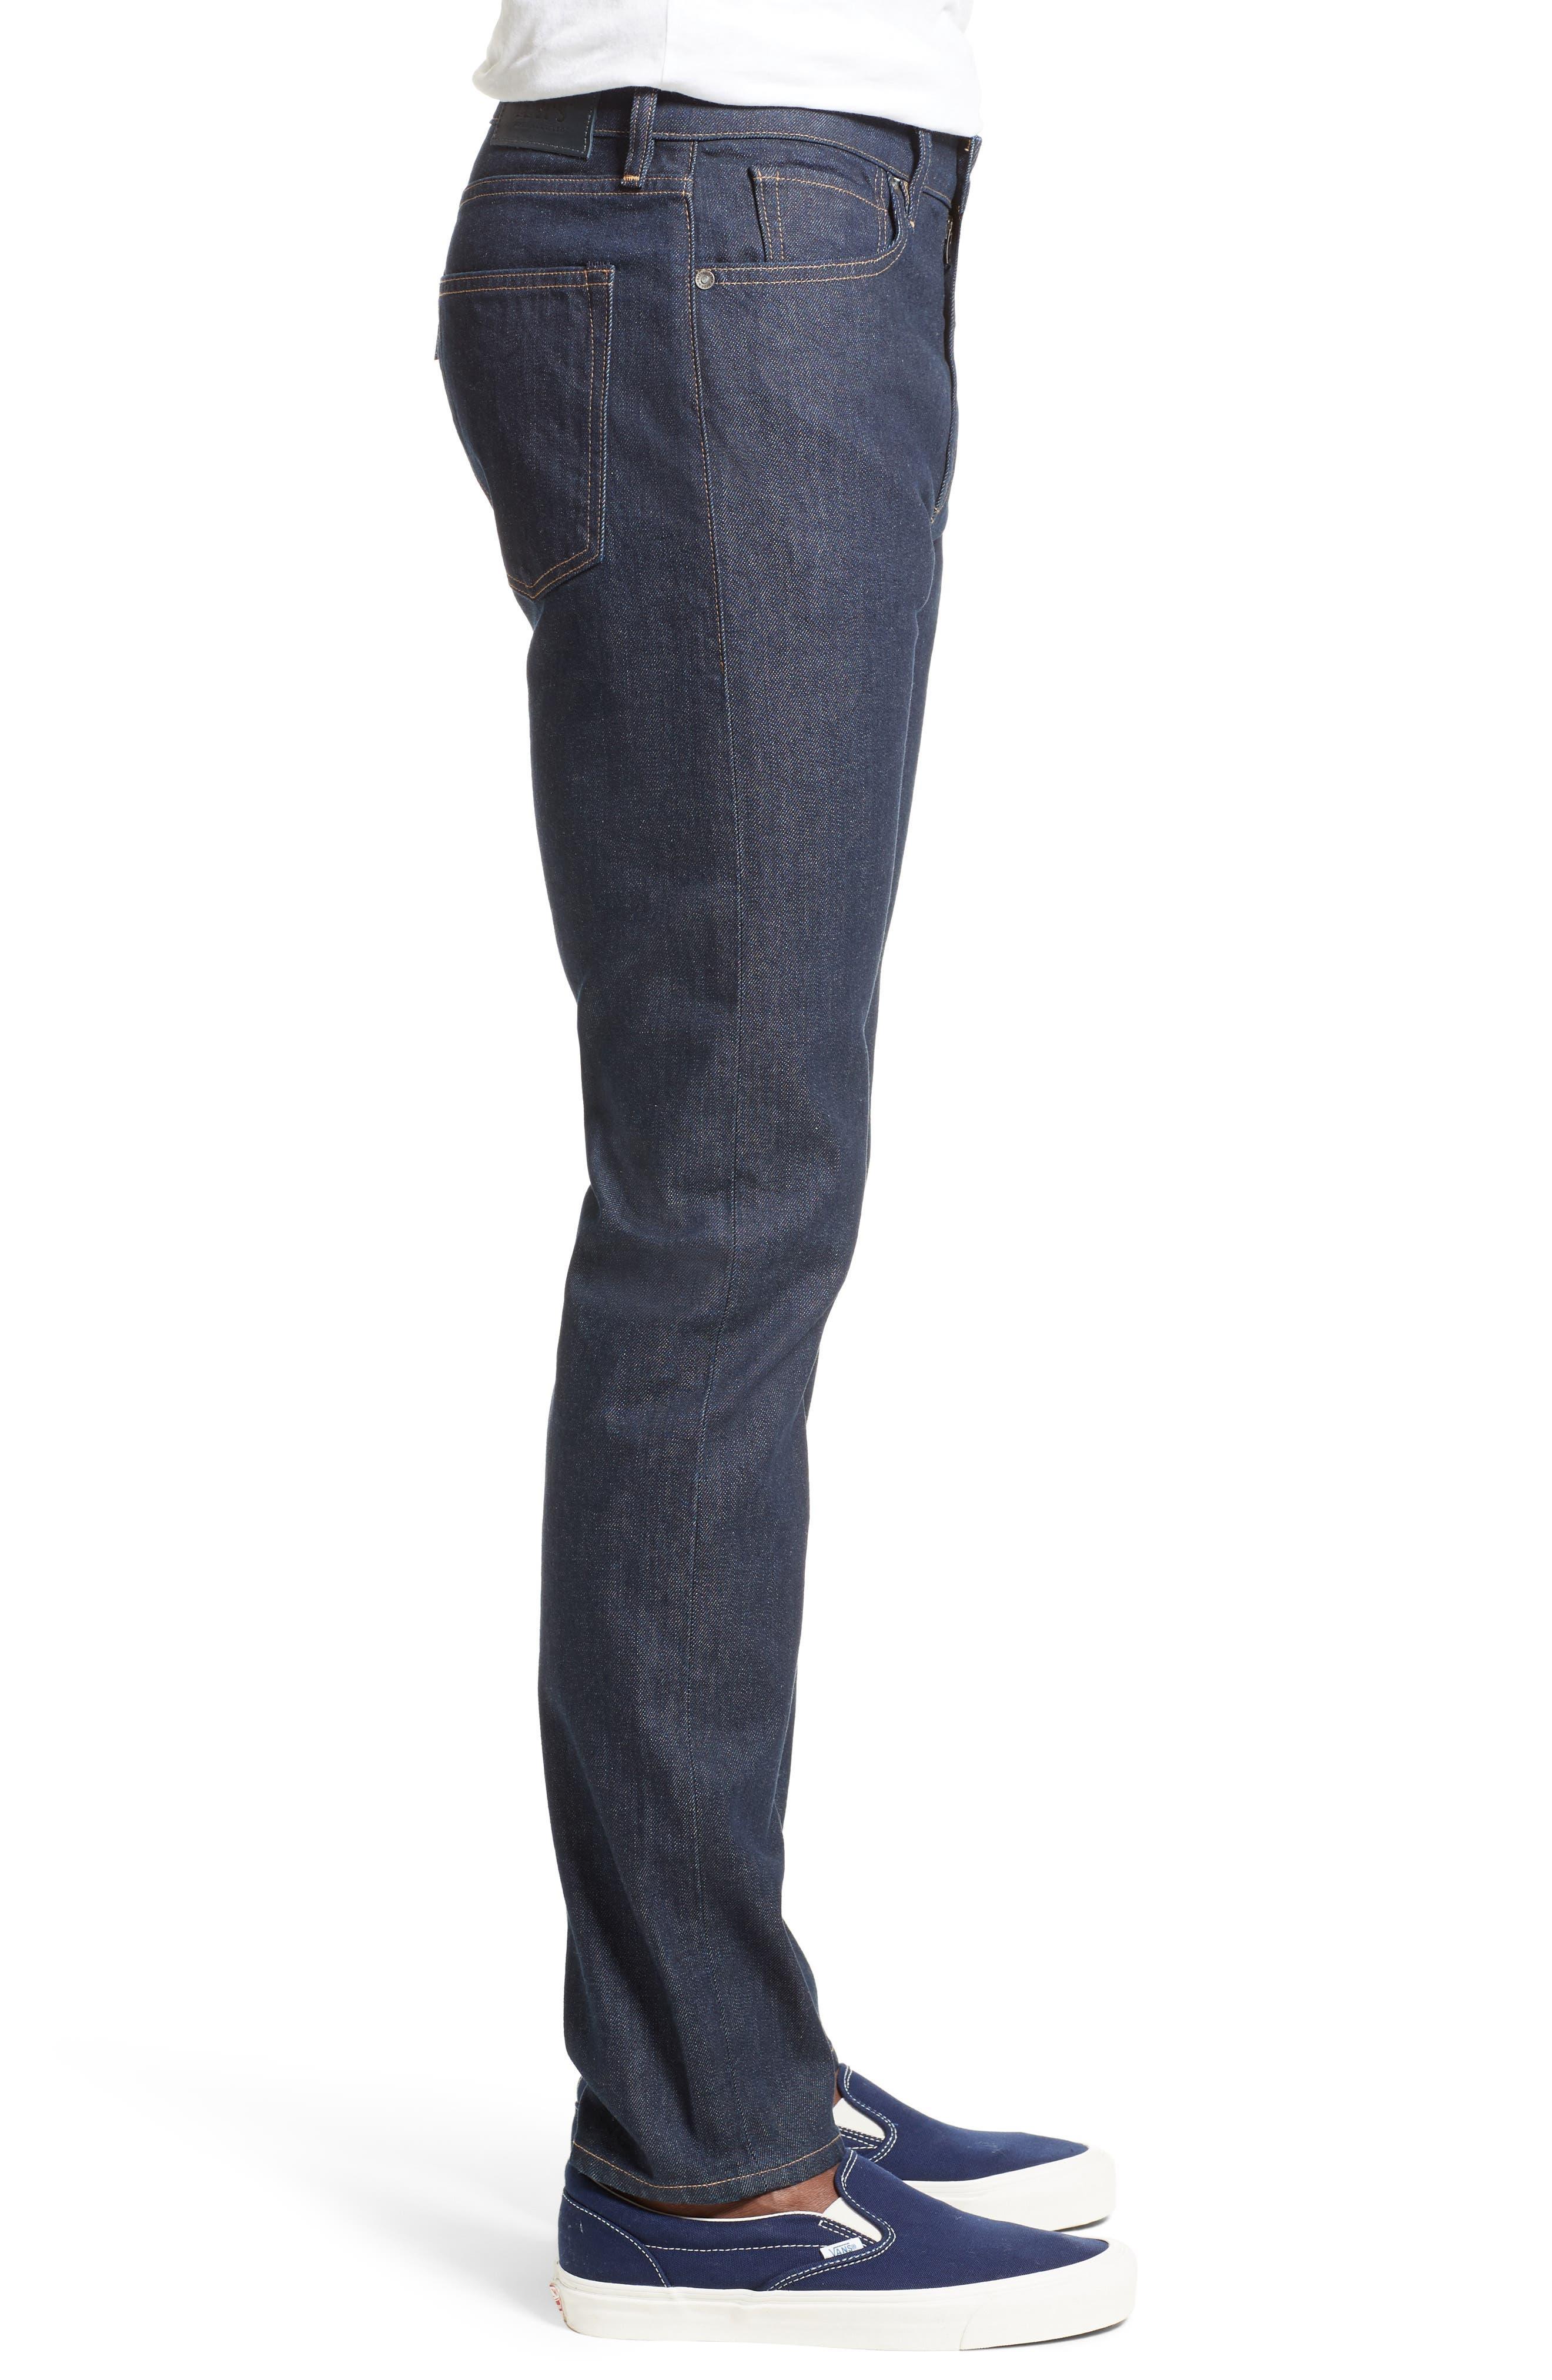 Tack Slim Fit Jeans,                             Alternate thumbnail 3, color,                             Dark Blue